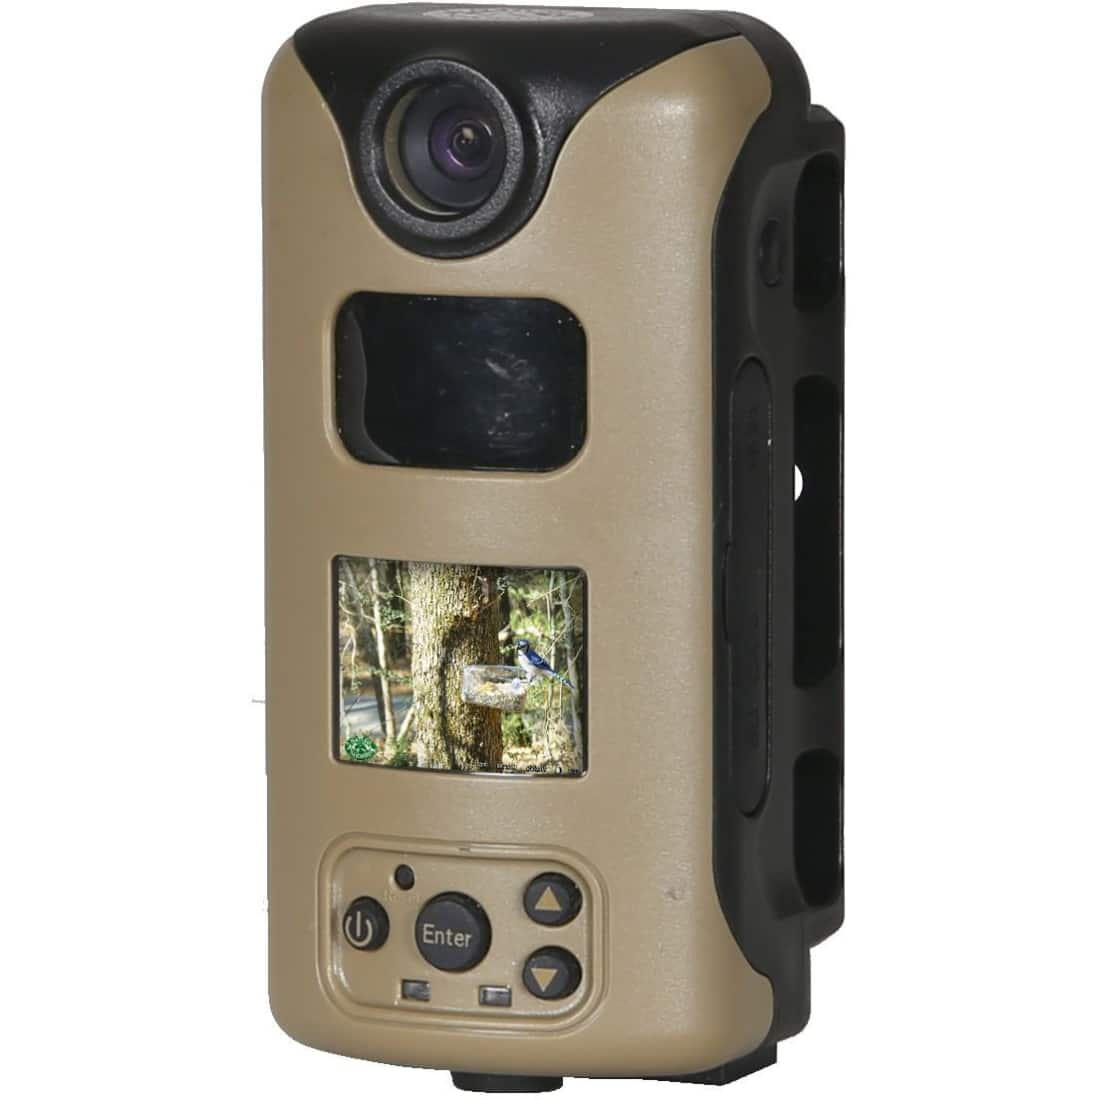 Wildgame Innovations Wing Spy 8 Digital Wildlife Camera - $20 - Walmart